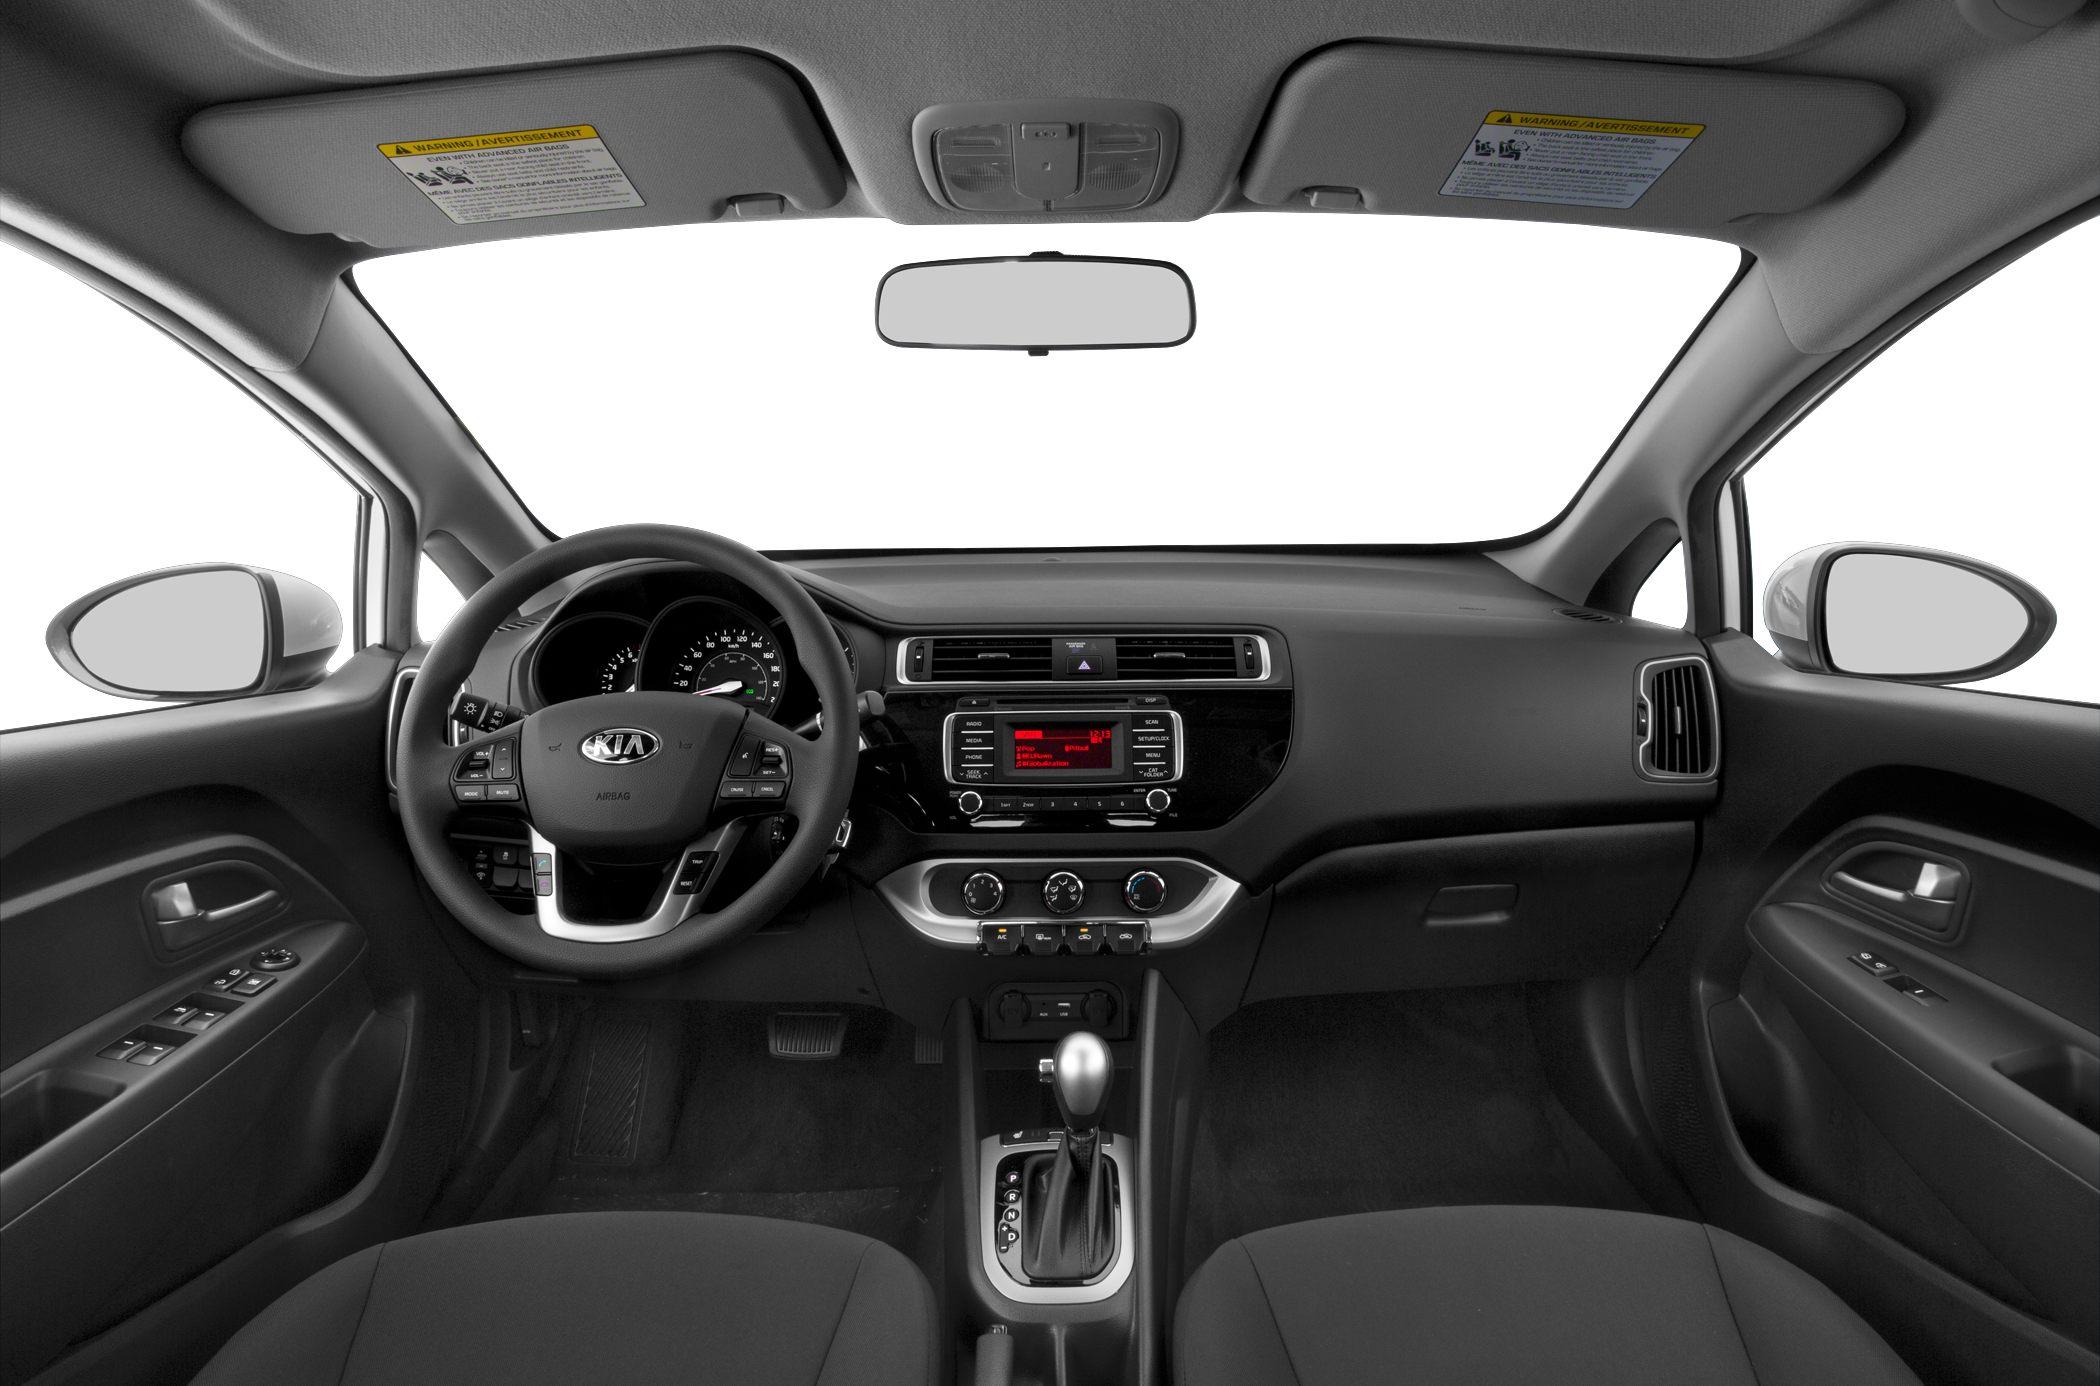 2015 Chevrolet Sonic Hatchback 2017 Kia Rio Reviews, Specs and Prices   Cars.com